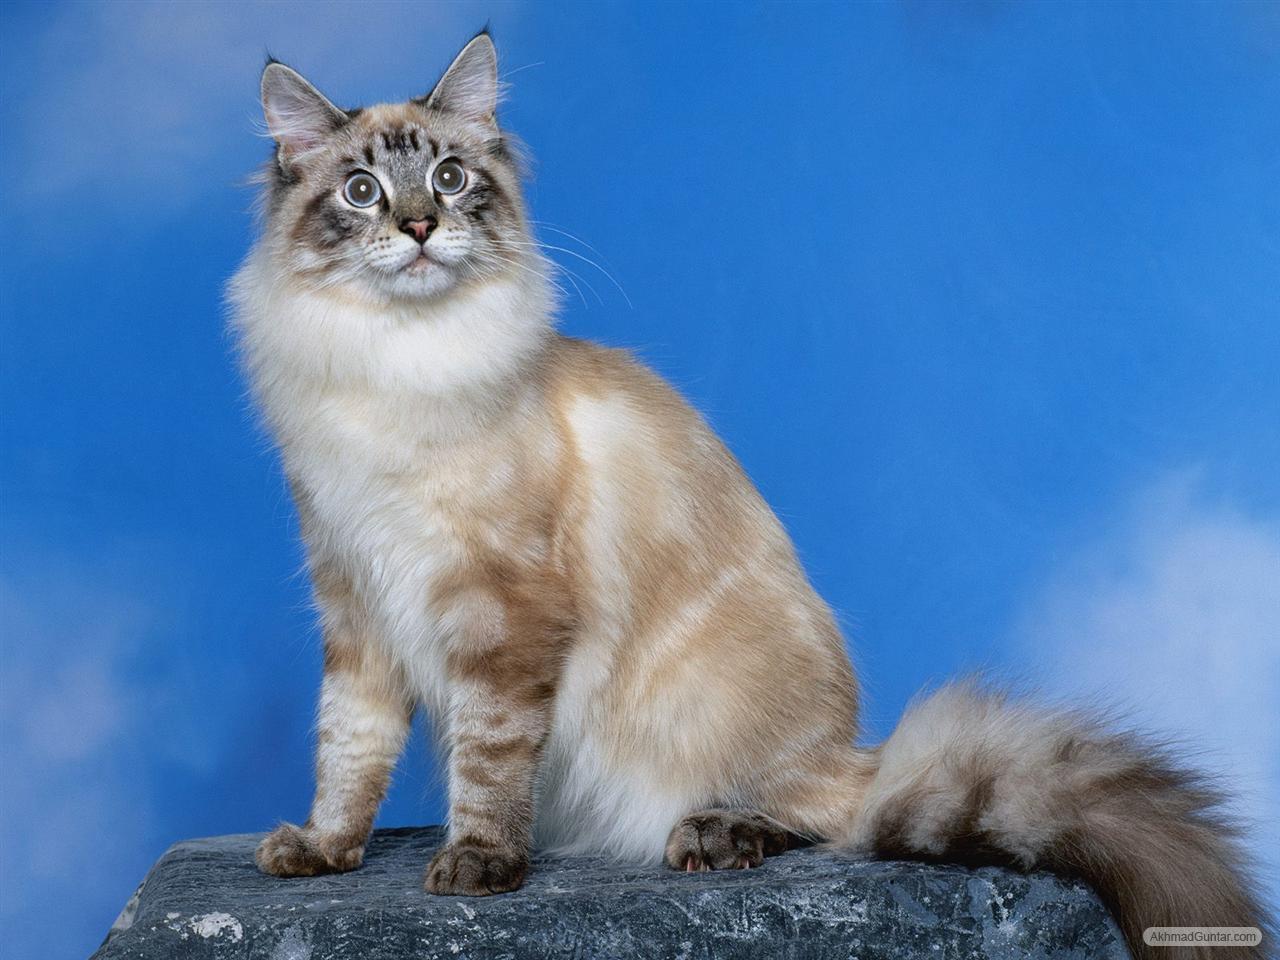 Perawatan Kucing Gambar Kucing Lucu Sedang Berpose